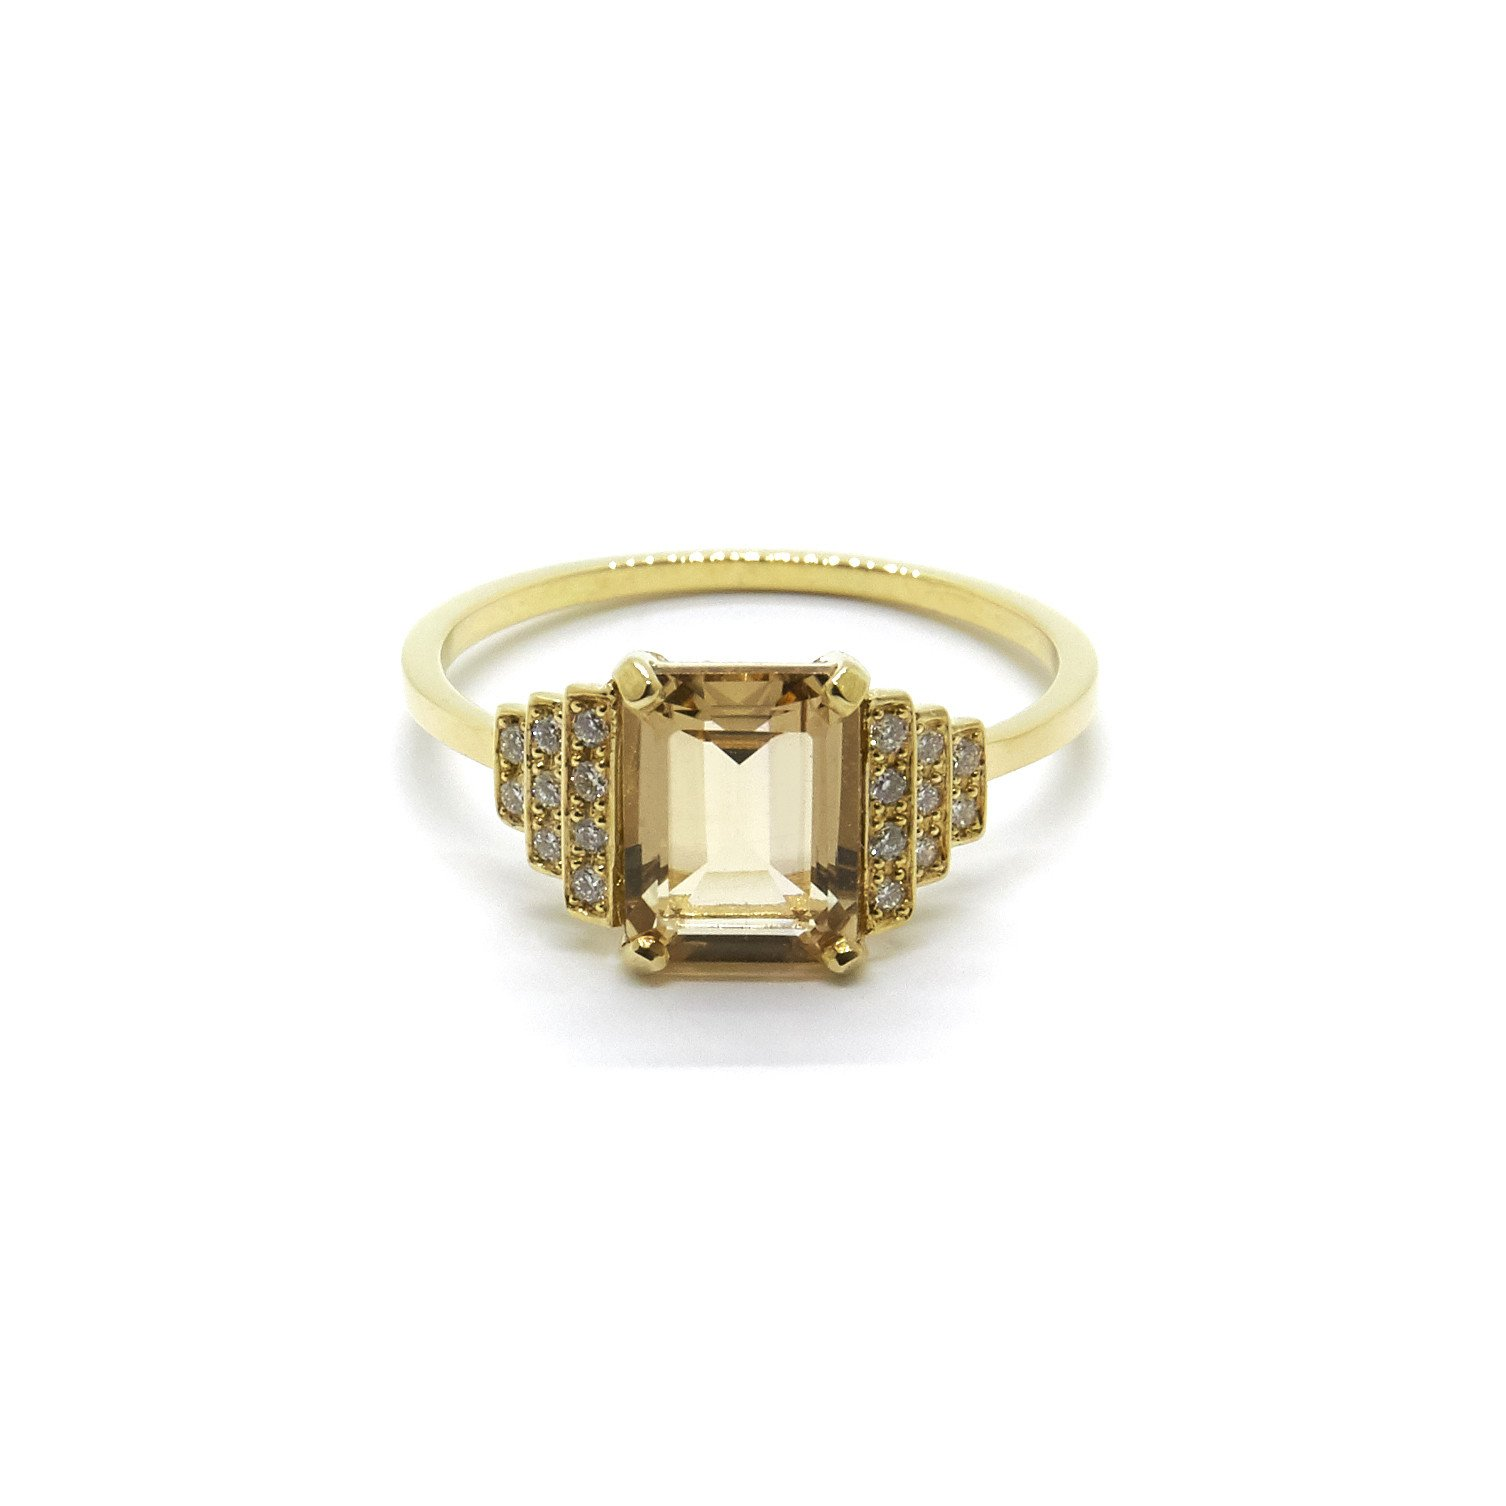 Natalie Marie Jewellery Maya Ring with Champagne Quartz and White Diamonds